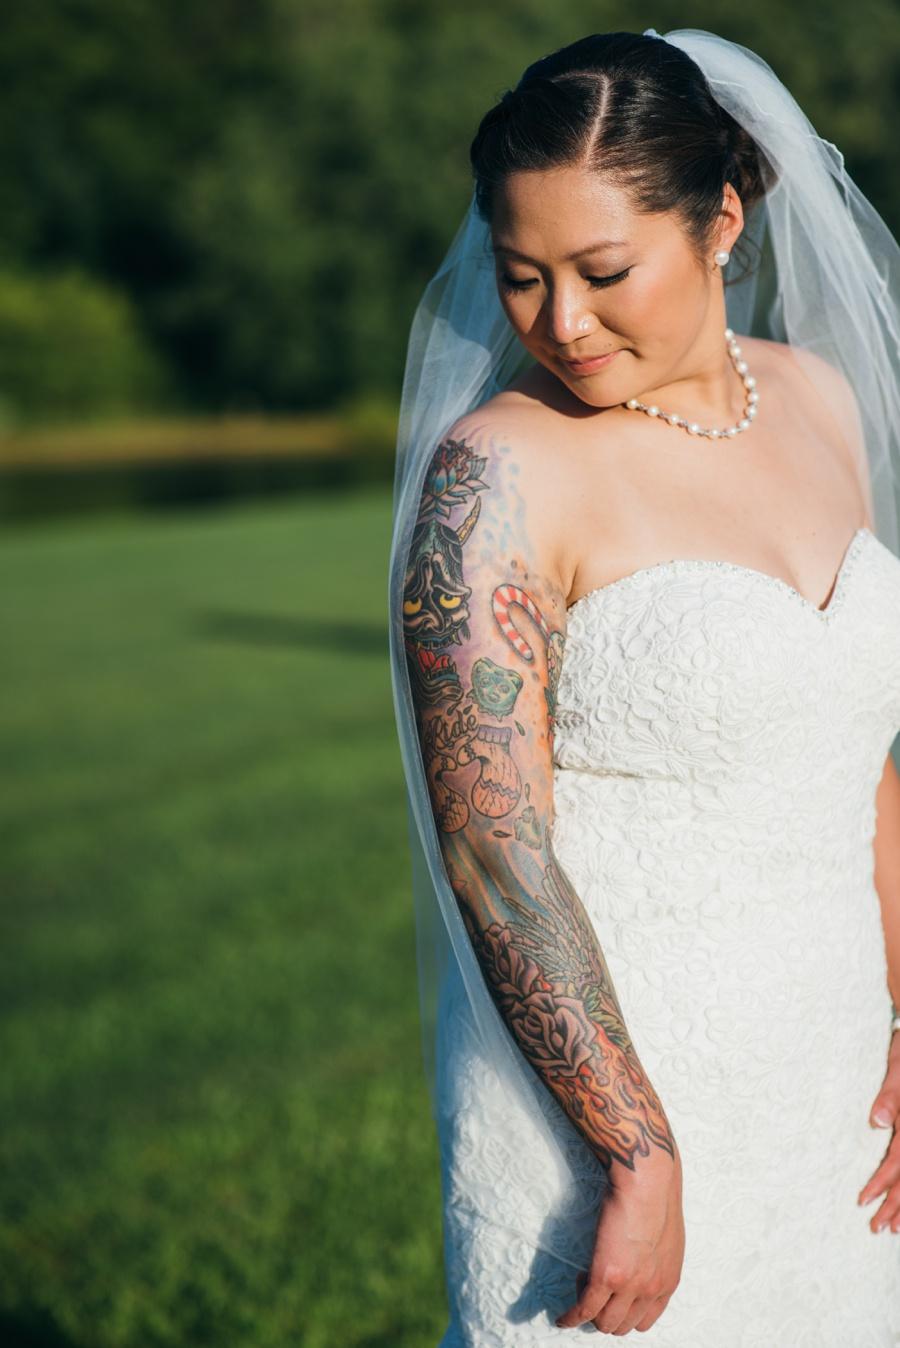 27pennsylvania-creative-wedding-photography.jpg